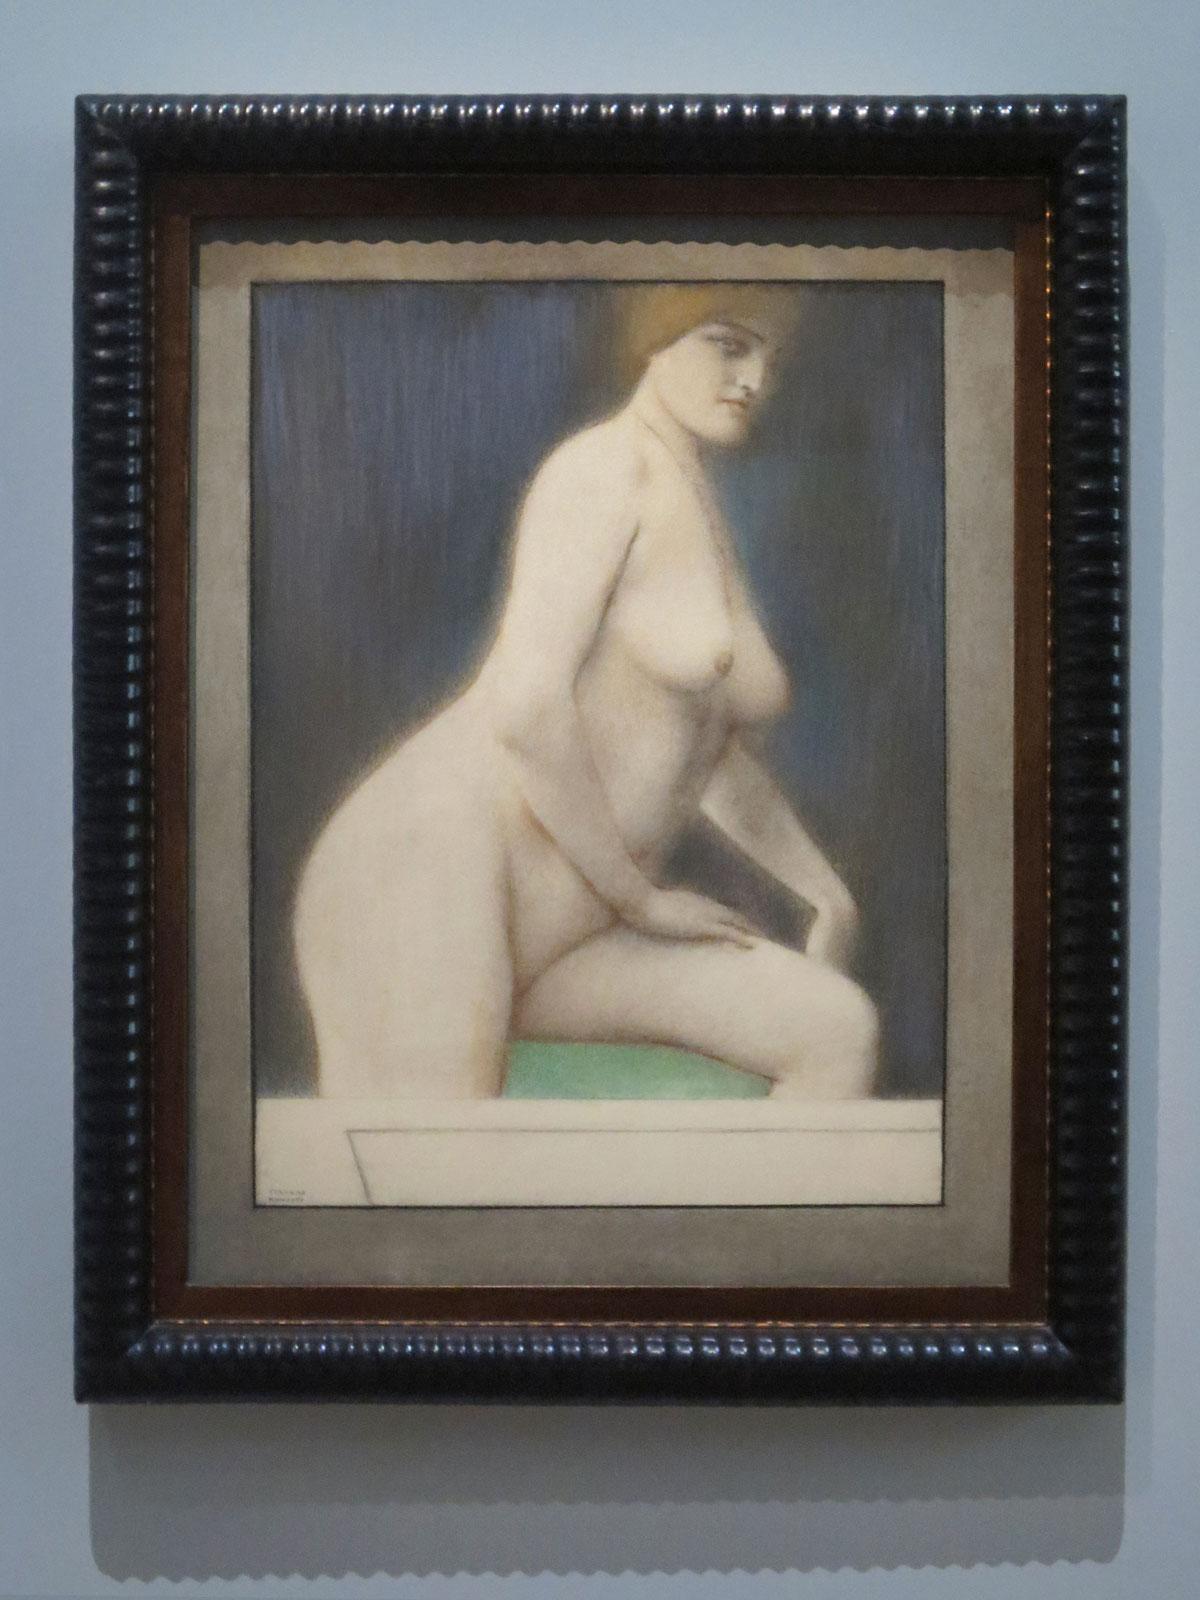 Fernand Khnopff, Déchéance, 1914